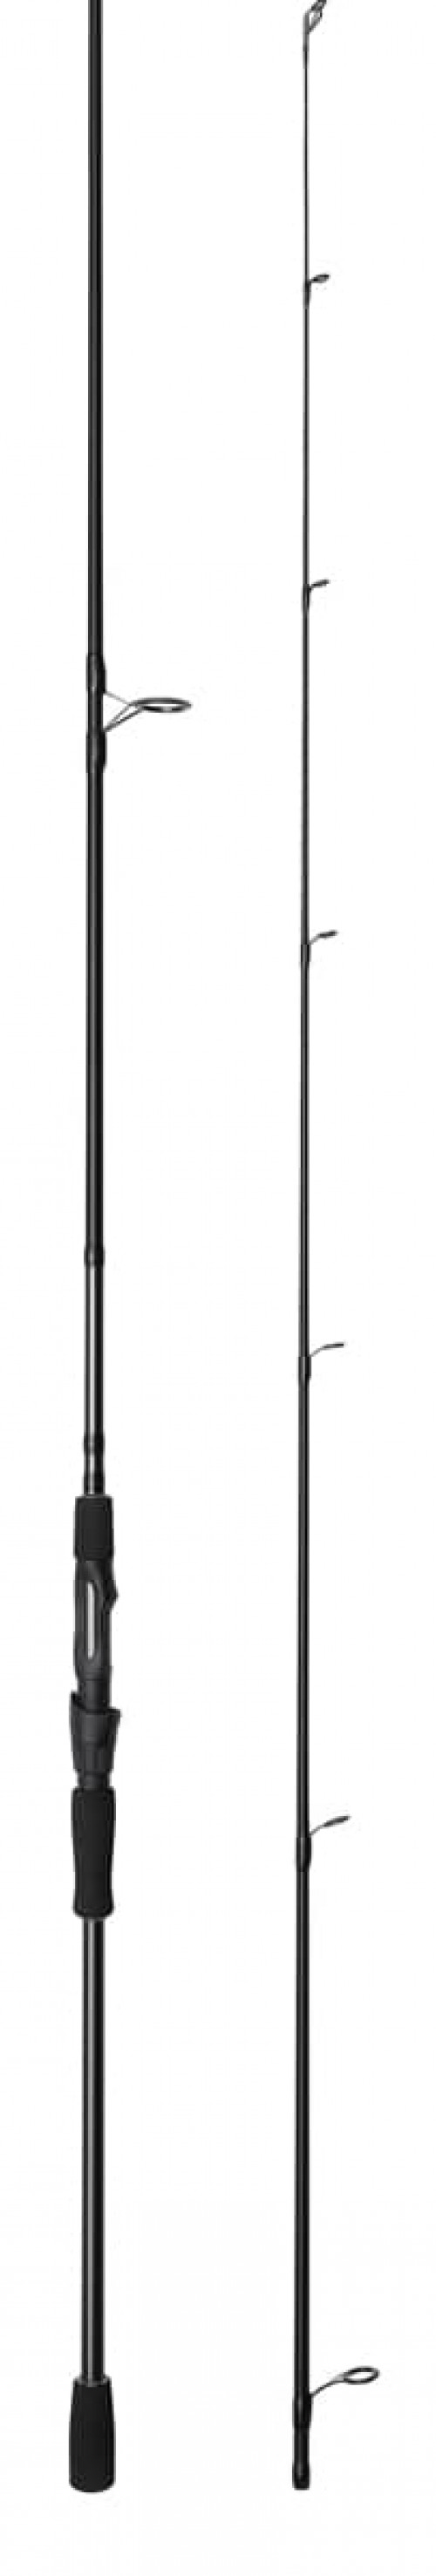 Okuma Altera Spin  6'0'' 180cm 5-20g - 2sec